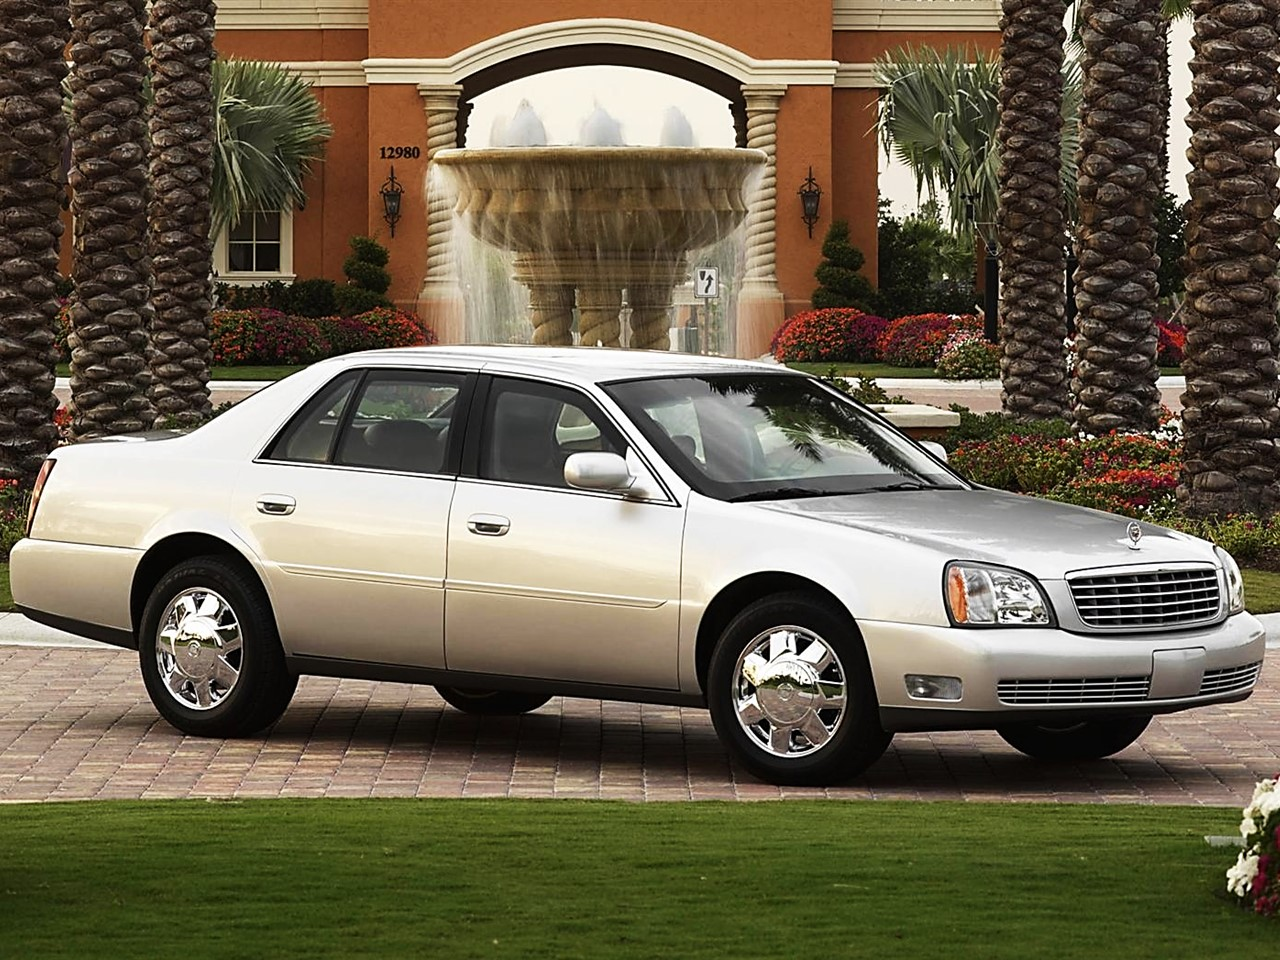 Cadillac 2006 cadillac deville : 2002 Cadillac DeVille: The Last of the Big Guns | NotoriousLuxury